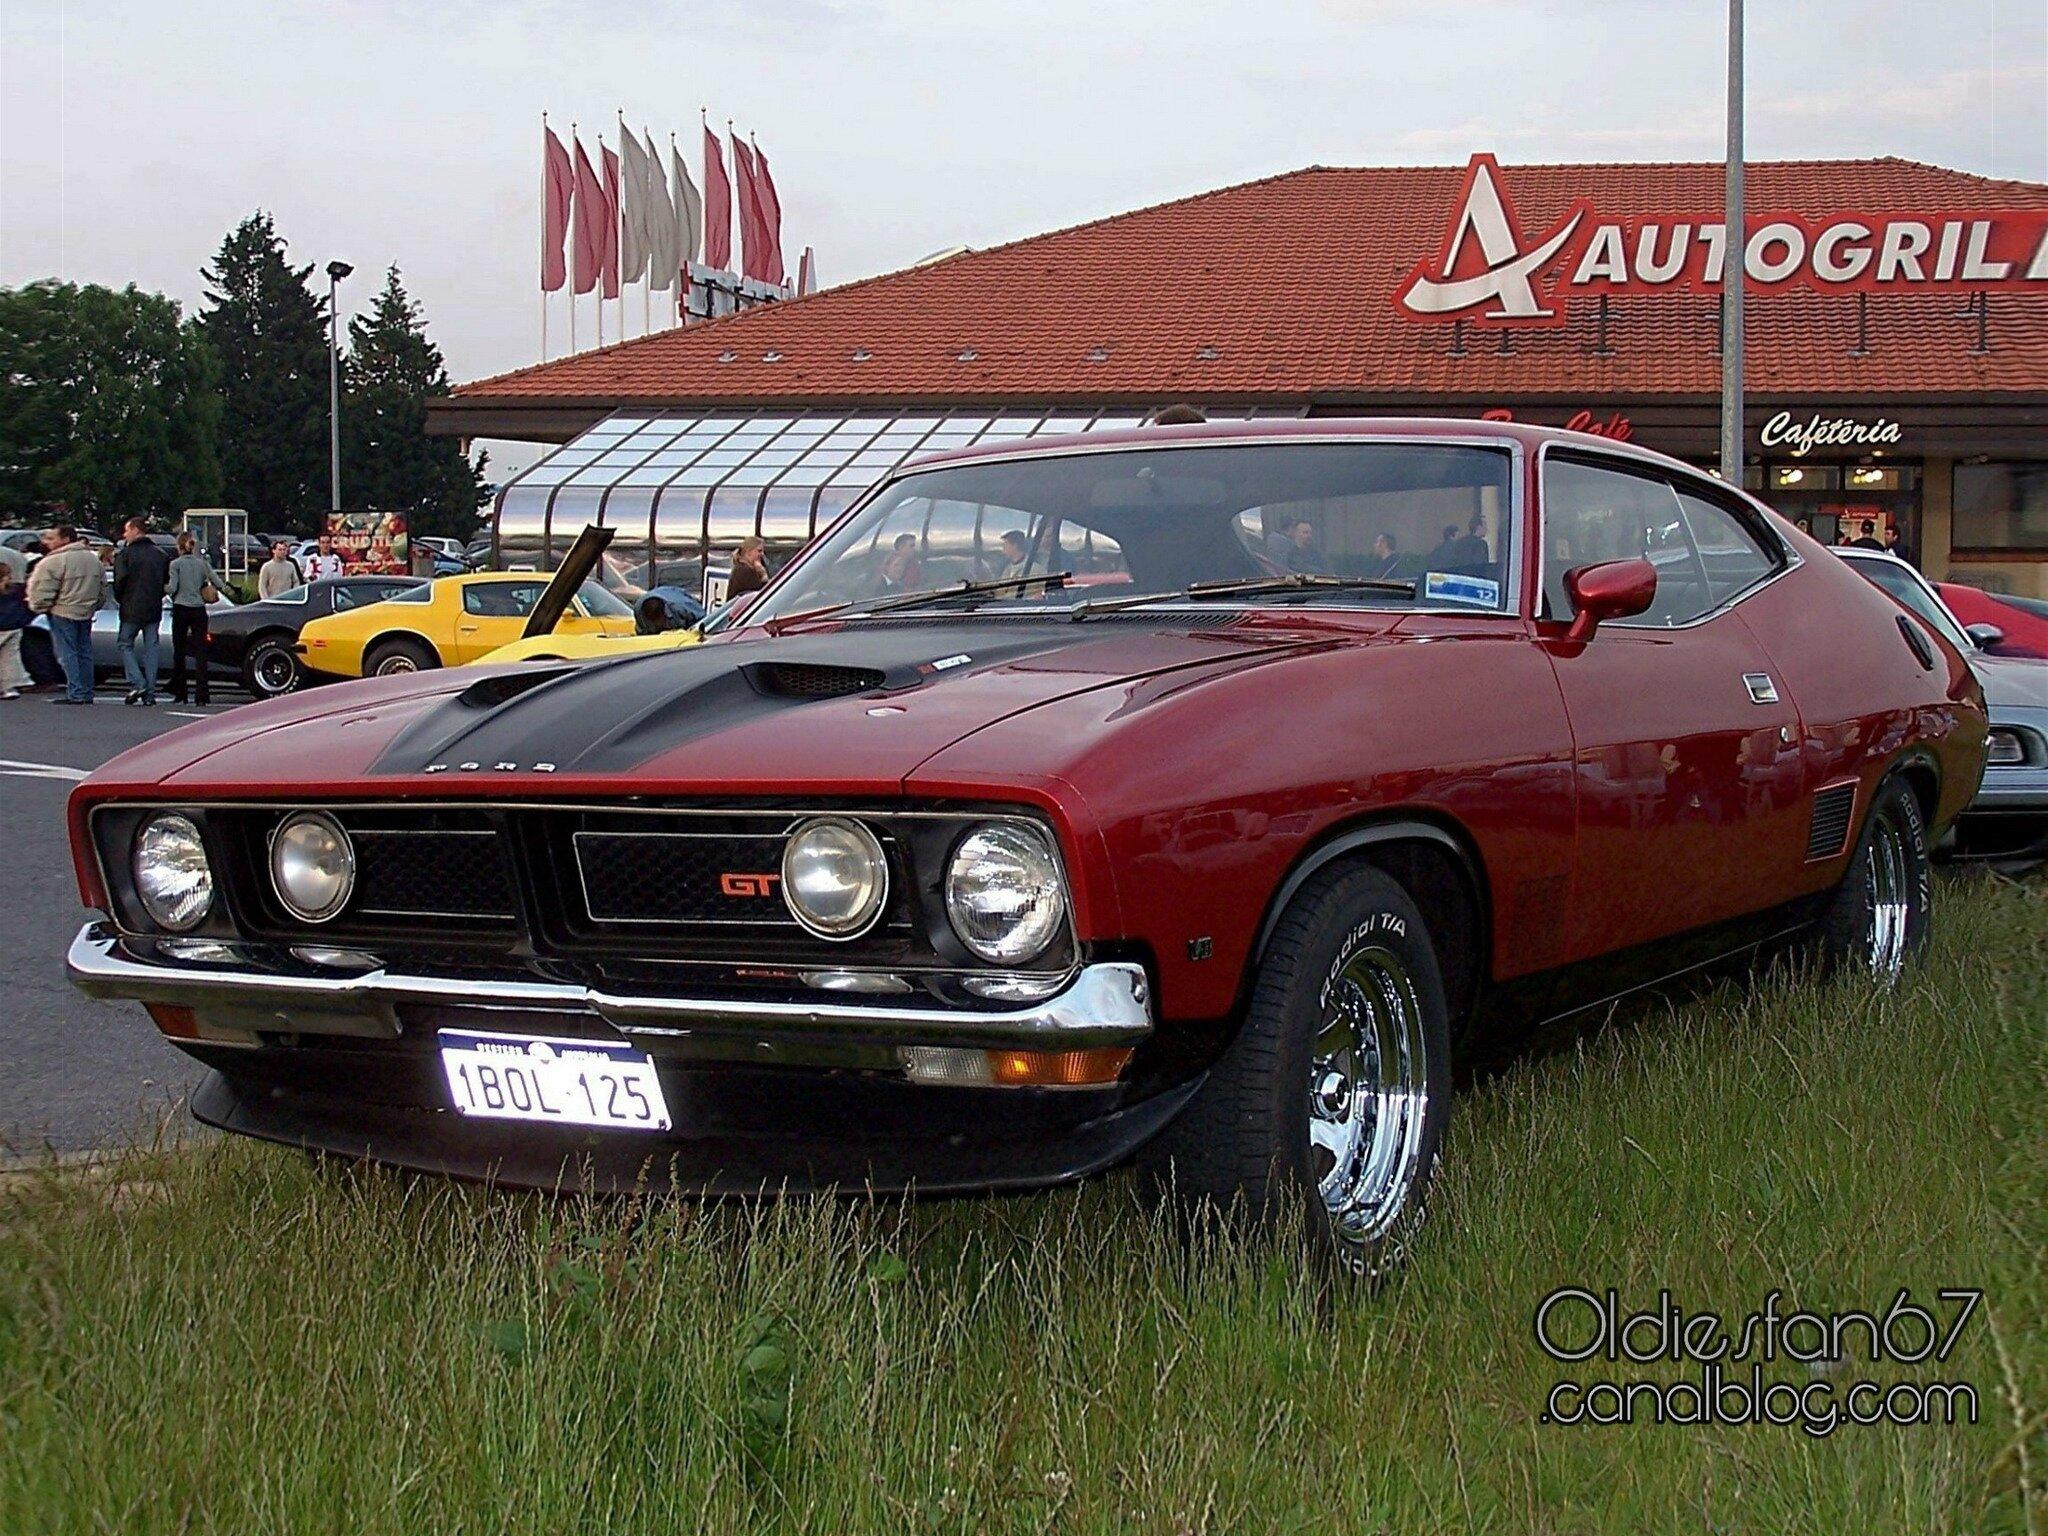 "Gran Torino Auto >> Ford Falcon XB GT351 Interceptor-1973 - Oldiesfan67 ""Mon blog auto"""